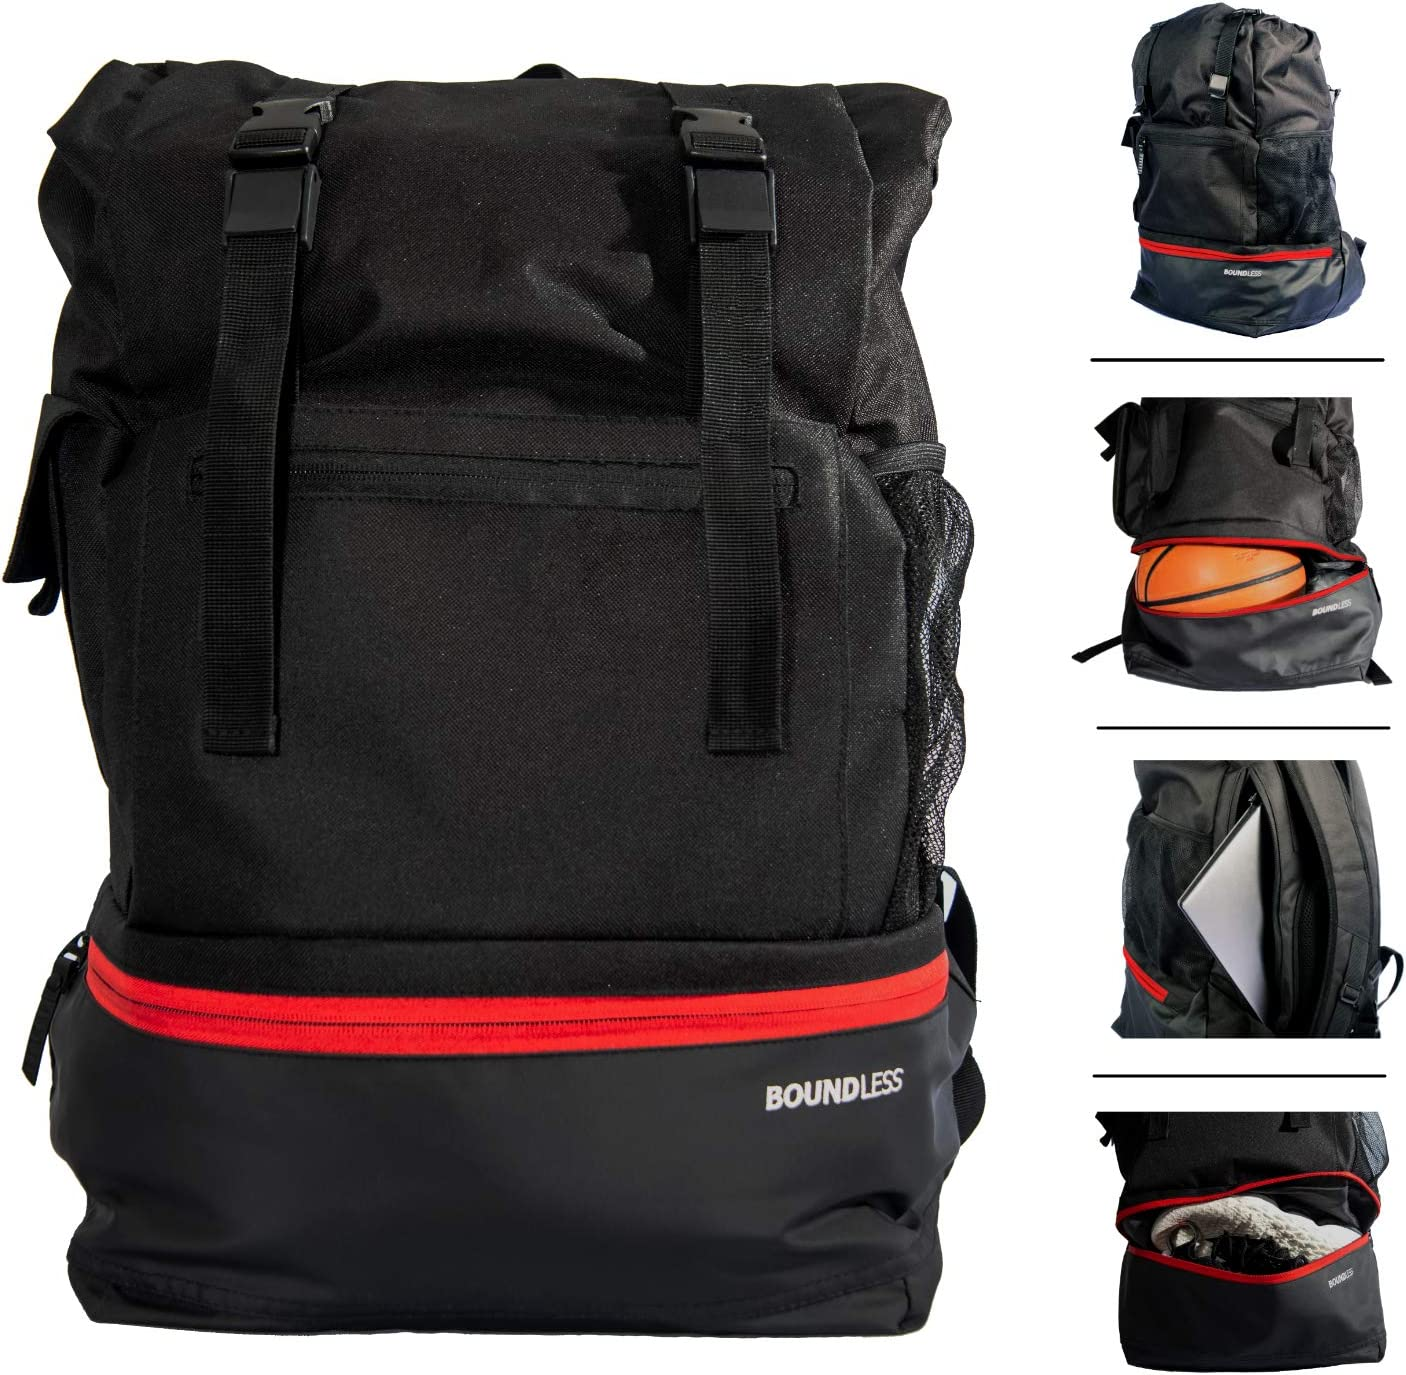 Boundless Blueprint Backpack - Basketball, Sports, Gym, Travel Backpack/Rucksack/Bag - Versatile, Stylish, Durable - Ball/Shoe Compartment, Laptop Sleeve, Inner Bag Divider